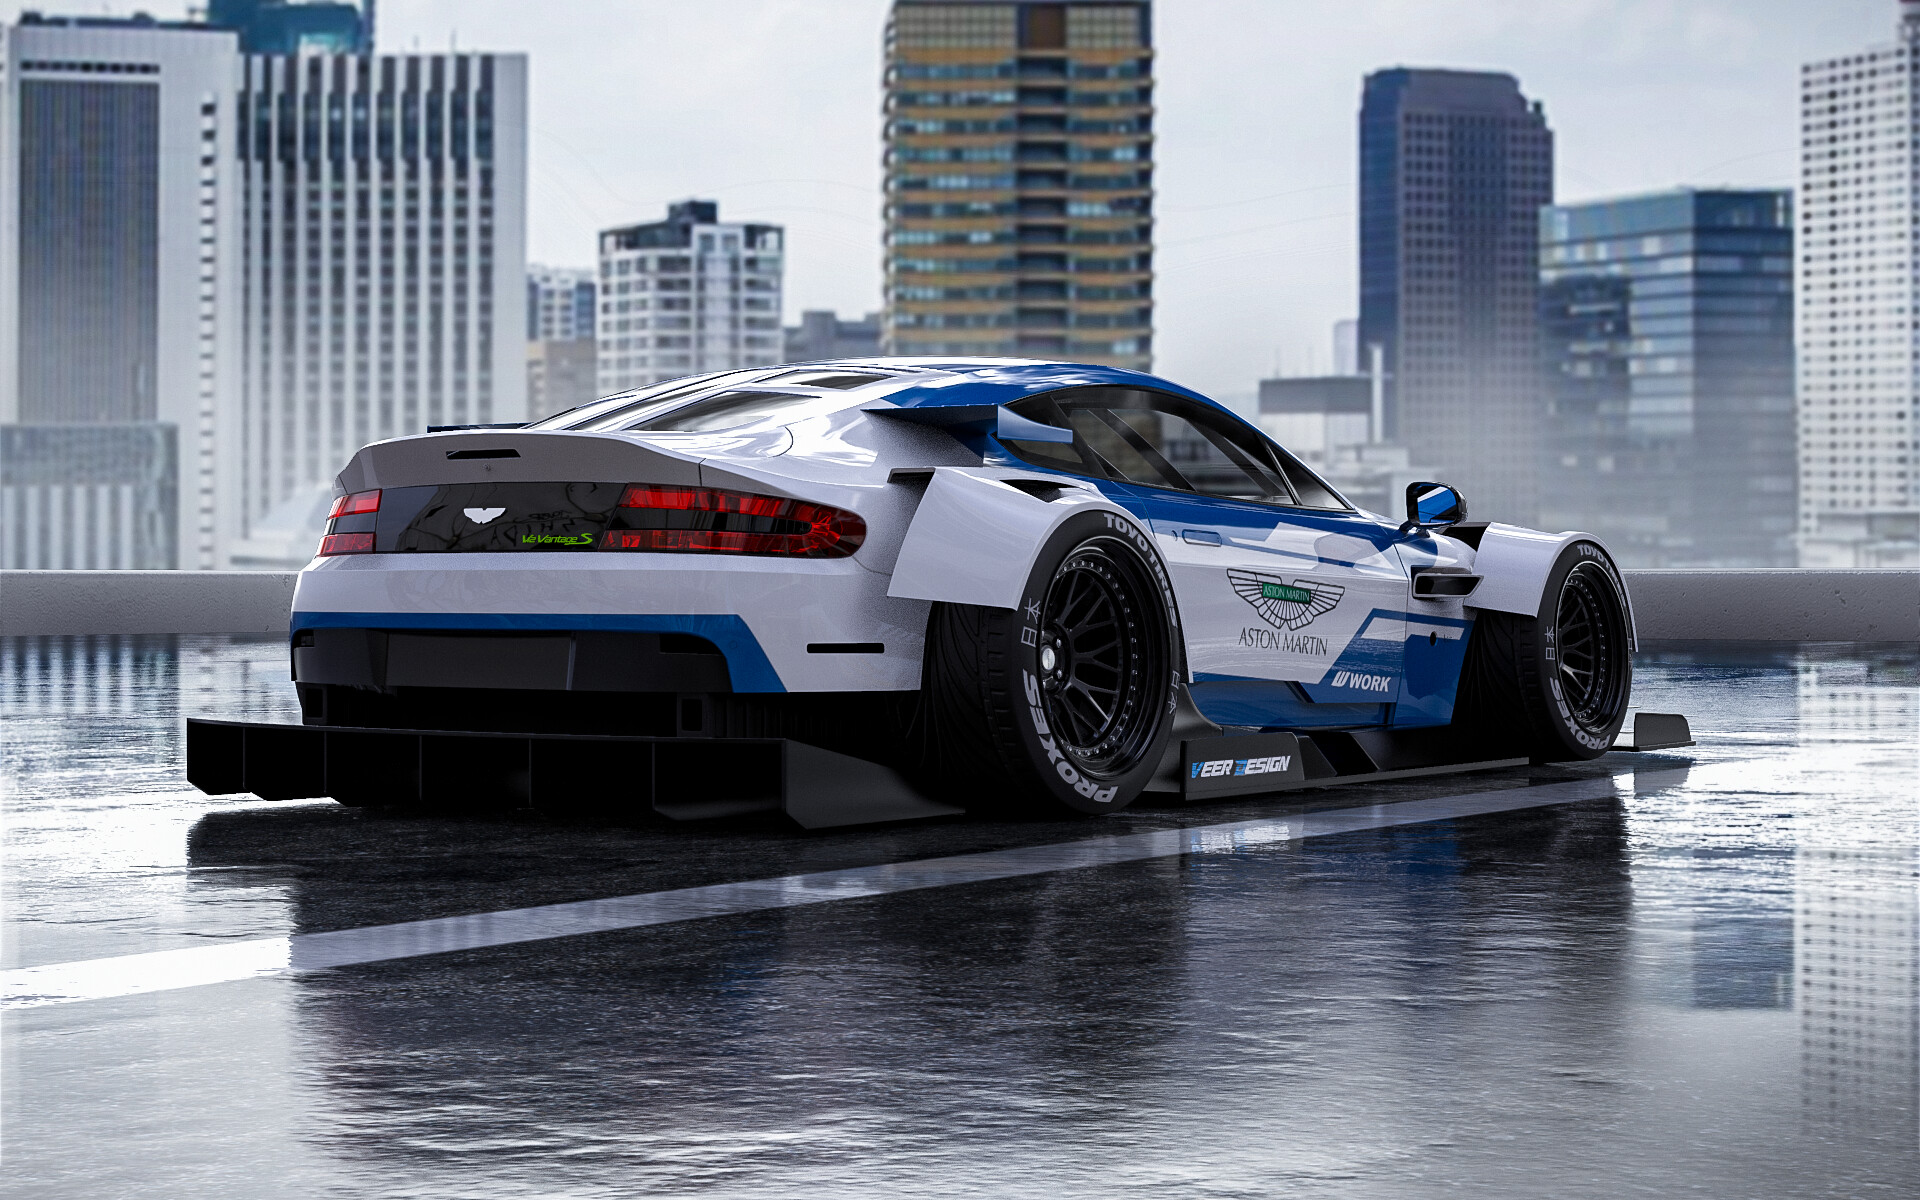 Veer Design Widebody Aston Martin V12 Vantage